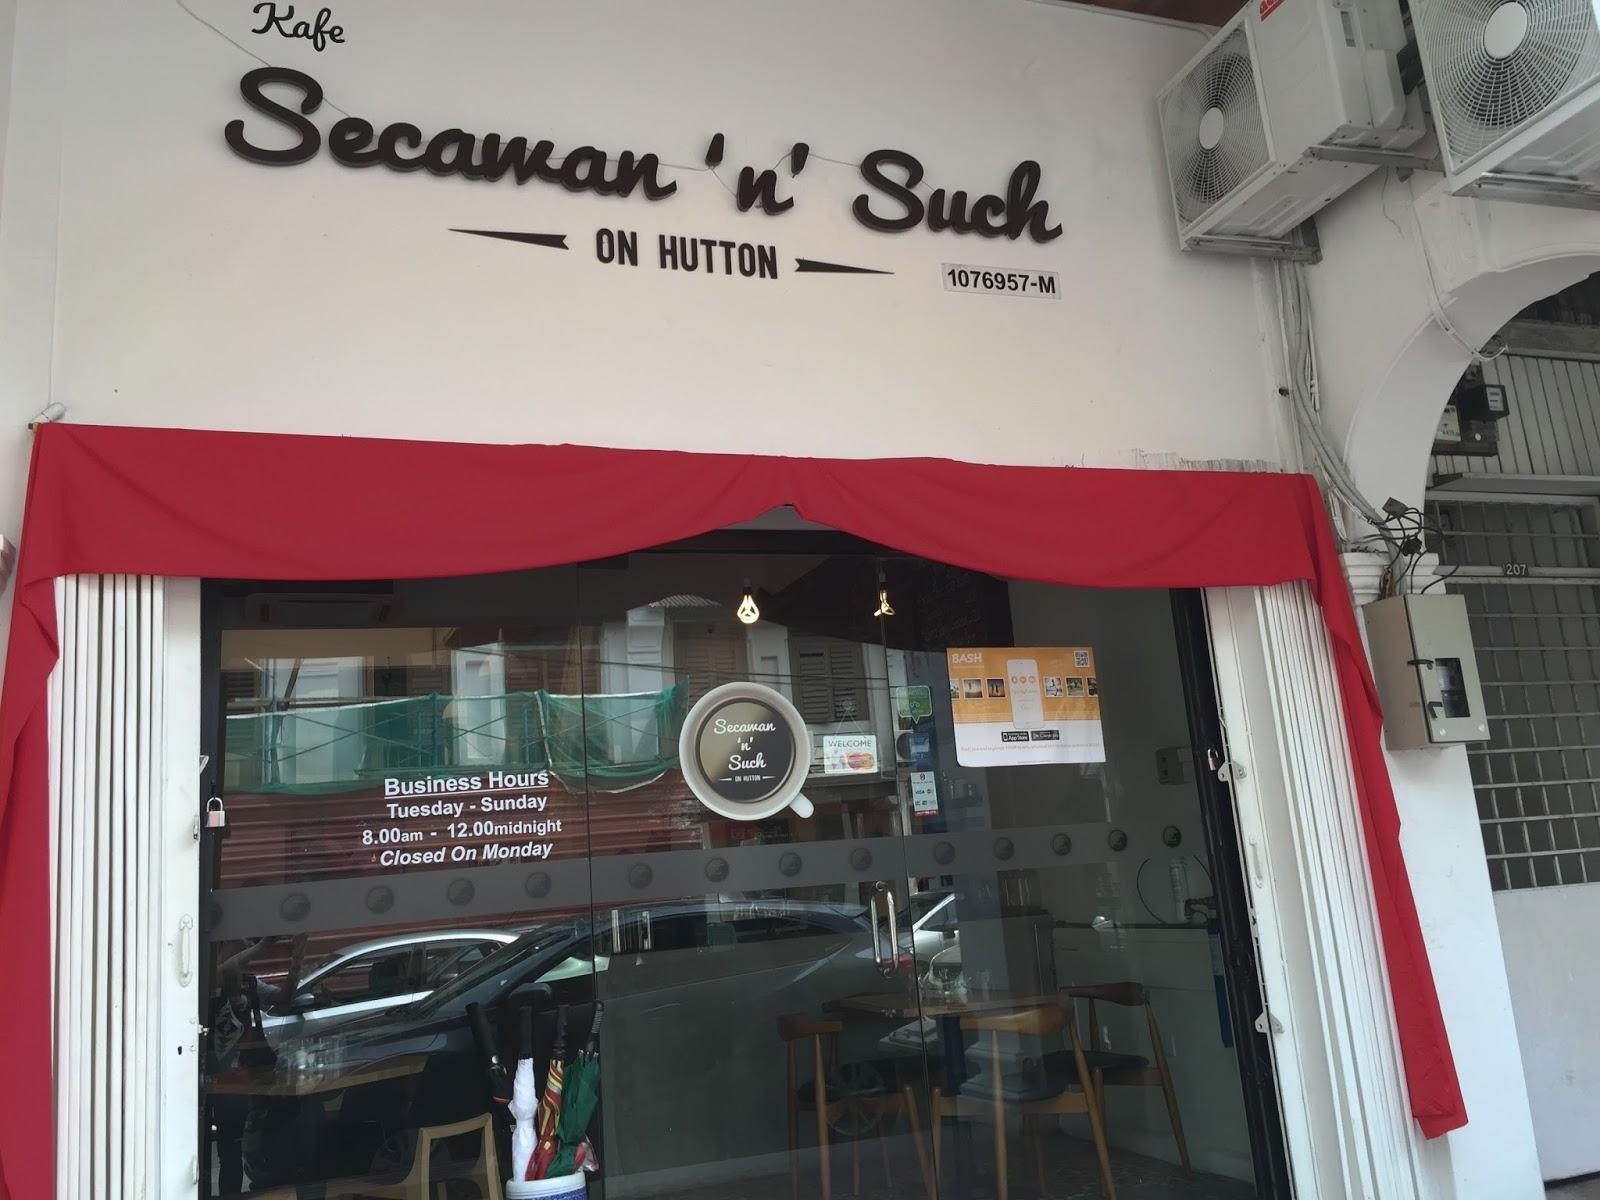 Penang Cafe - Secawan 'n' Such